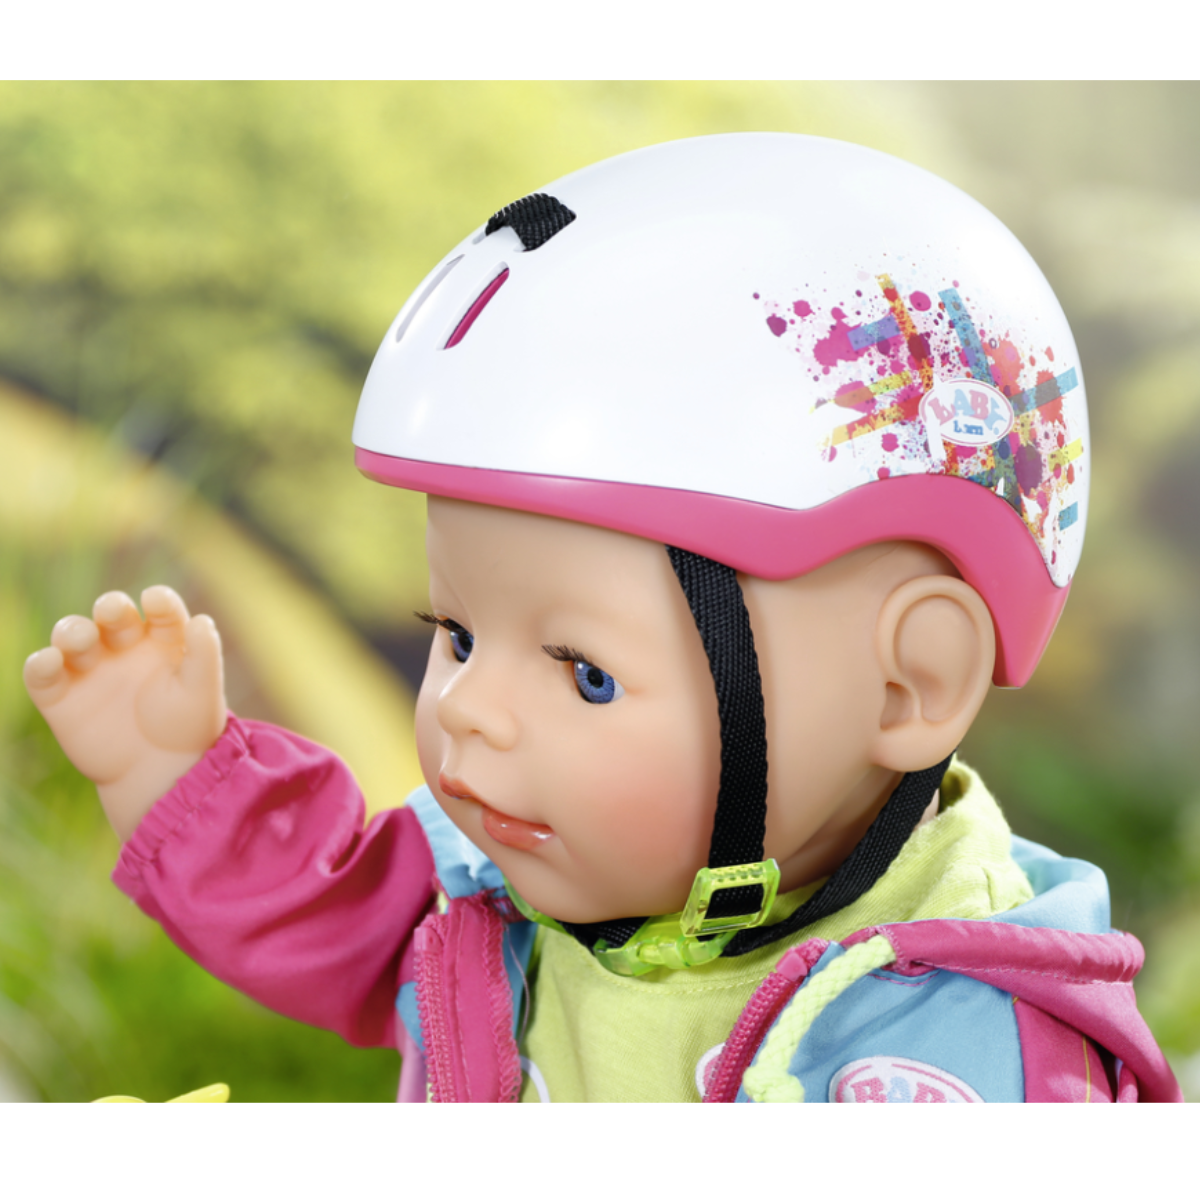 Ludibrium-Zapf Creation - BABY born - PlayFun Fahrradhelm